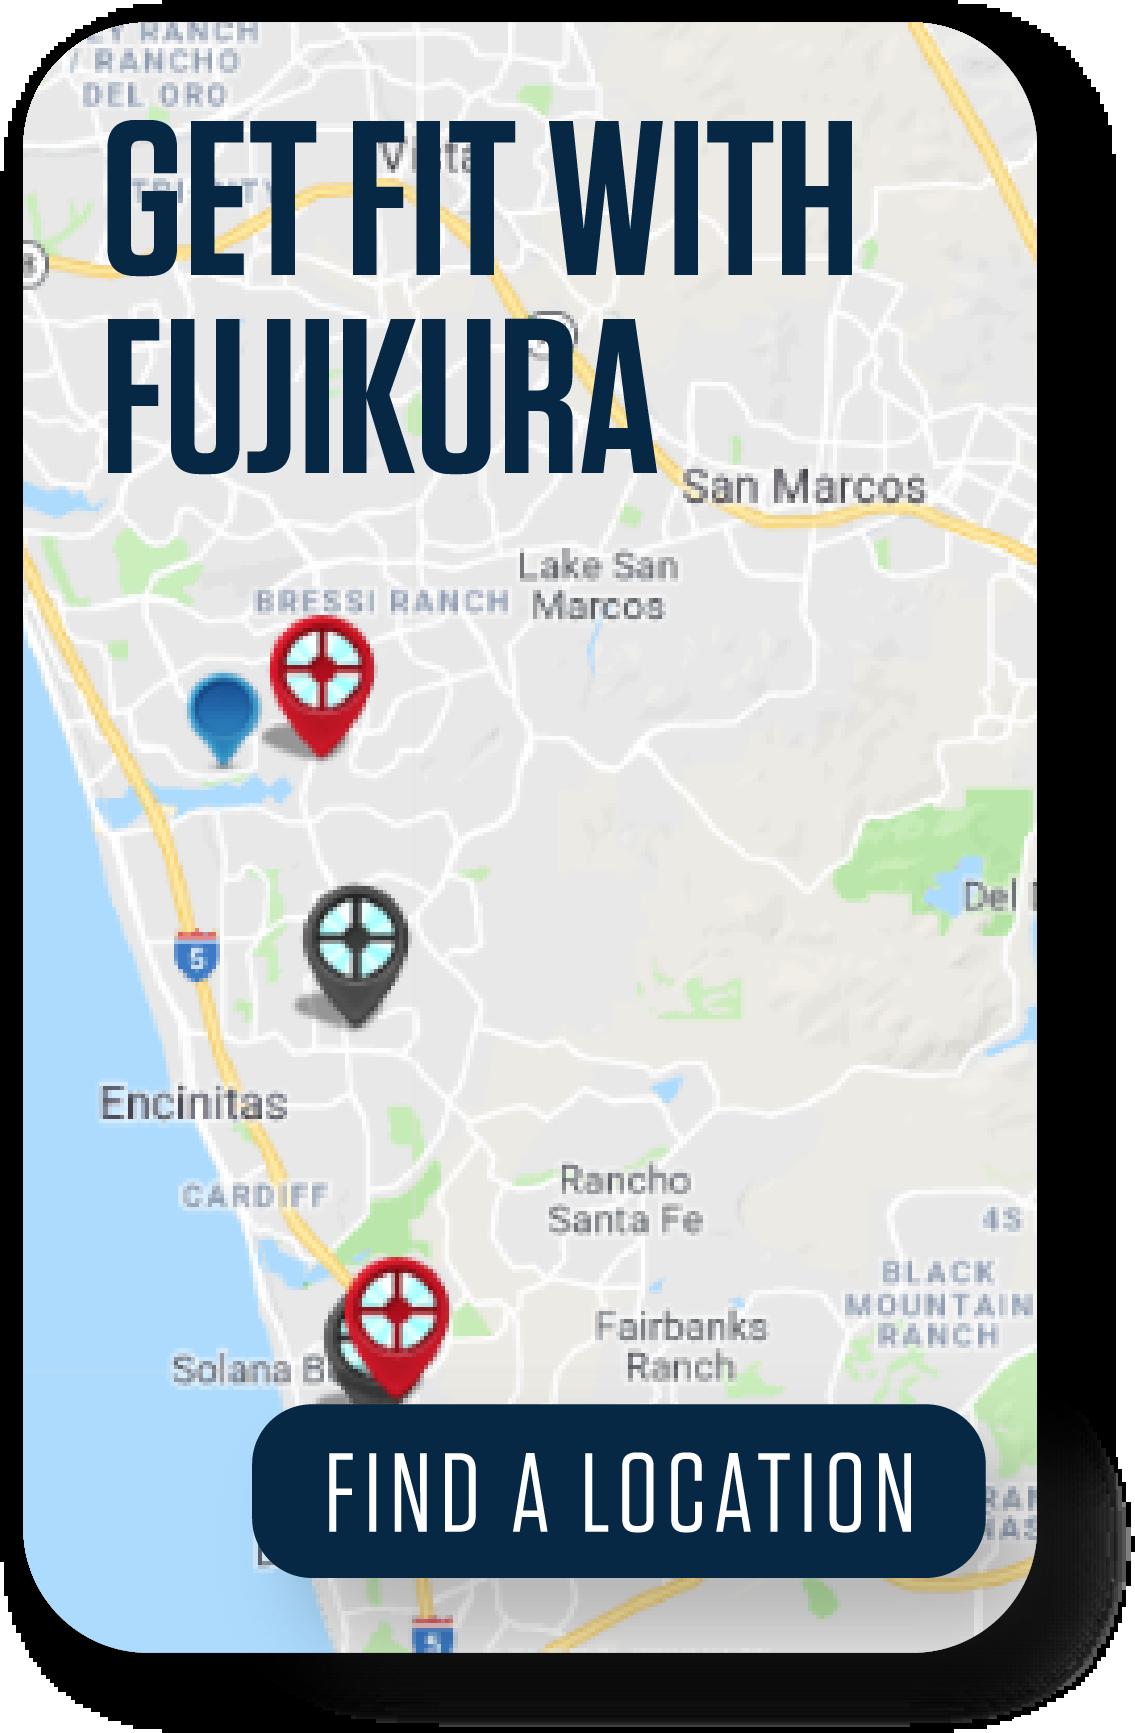 Fujikura Golf | The World's Best Performance Golf Shafts